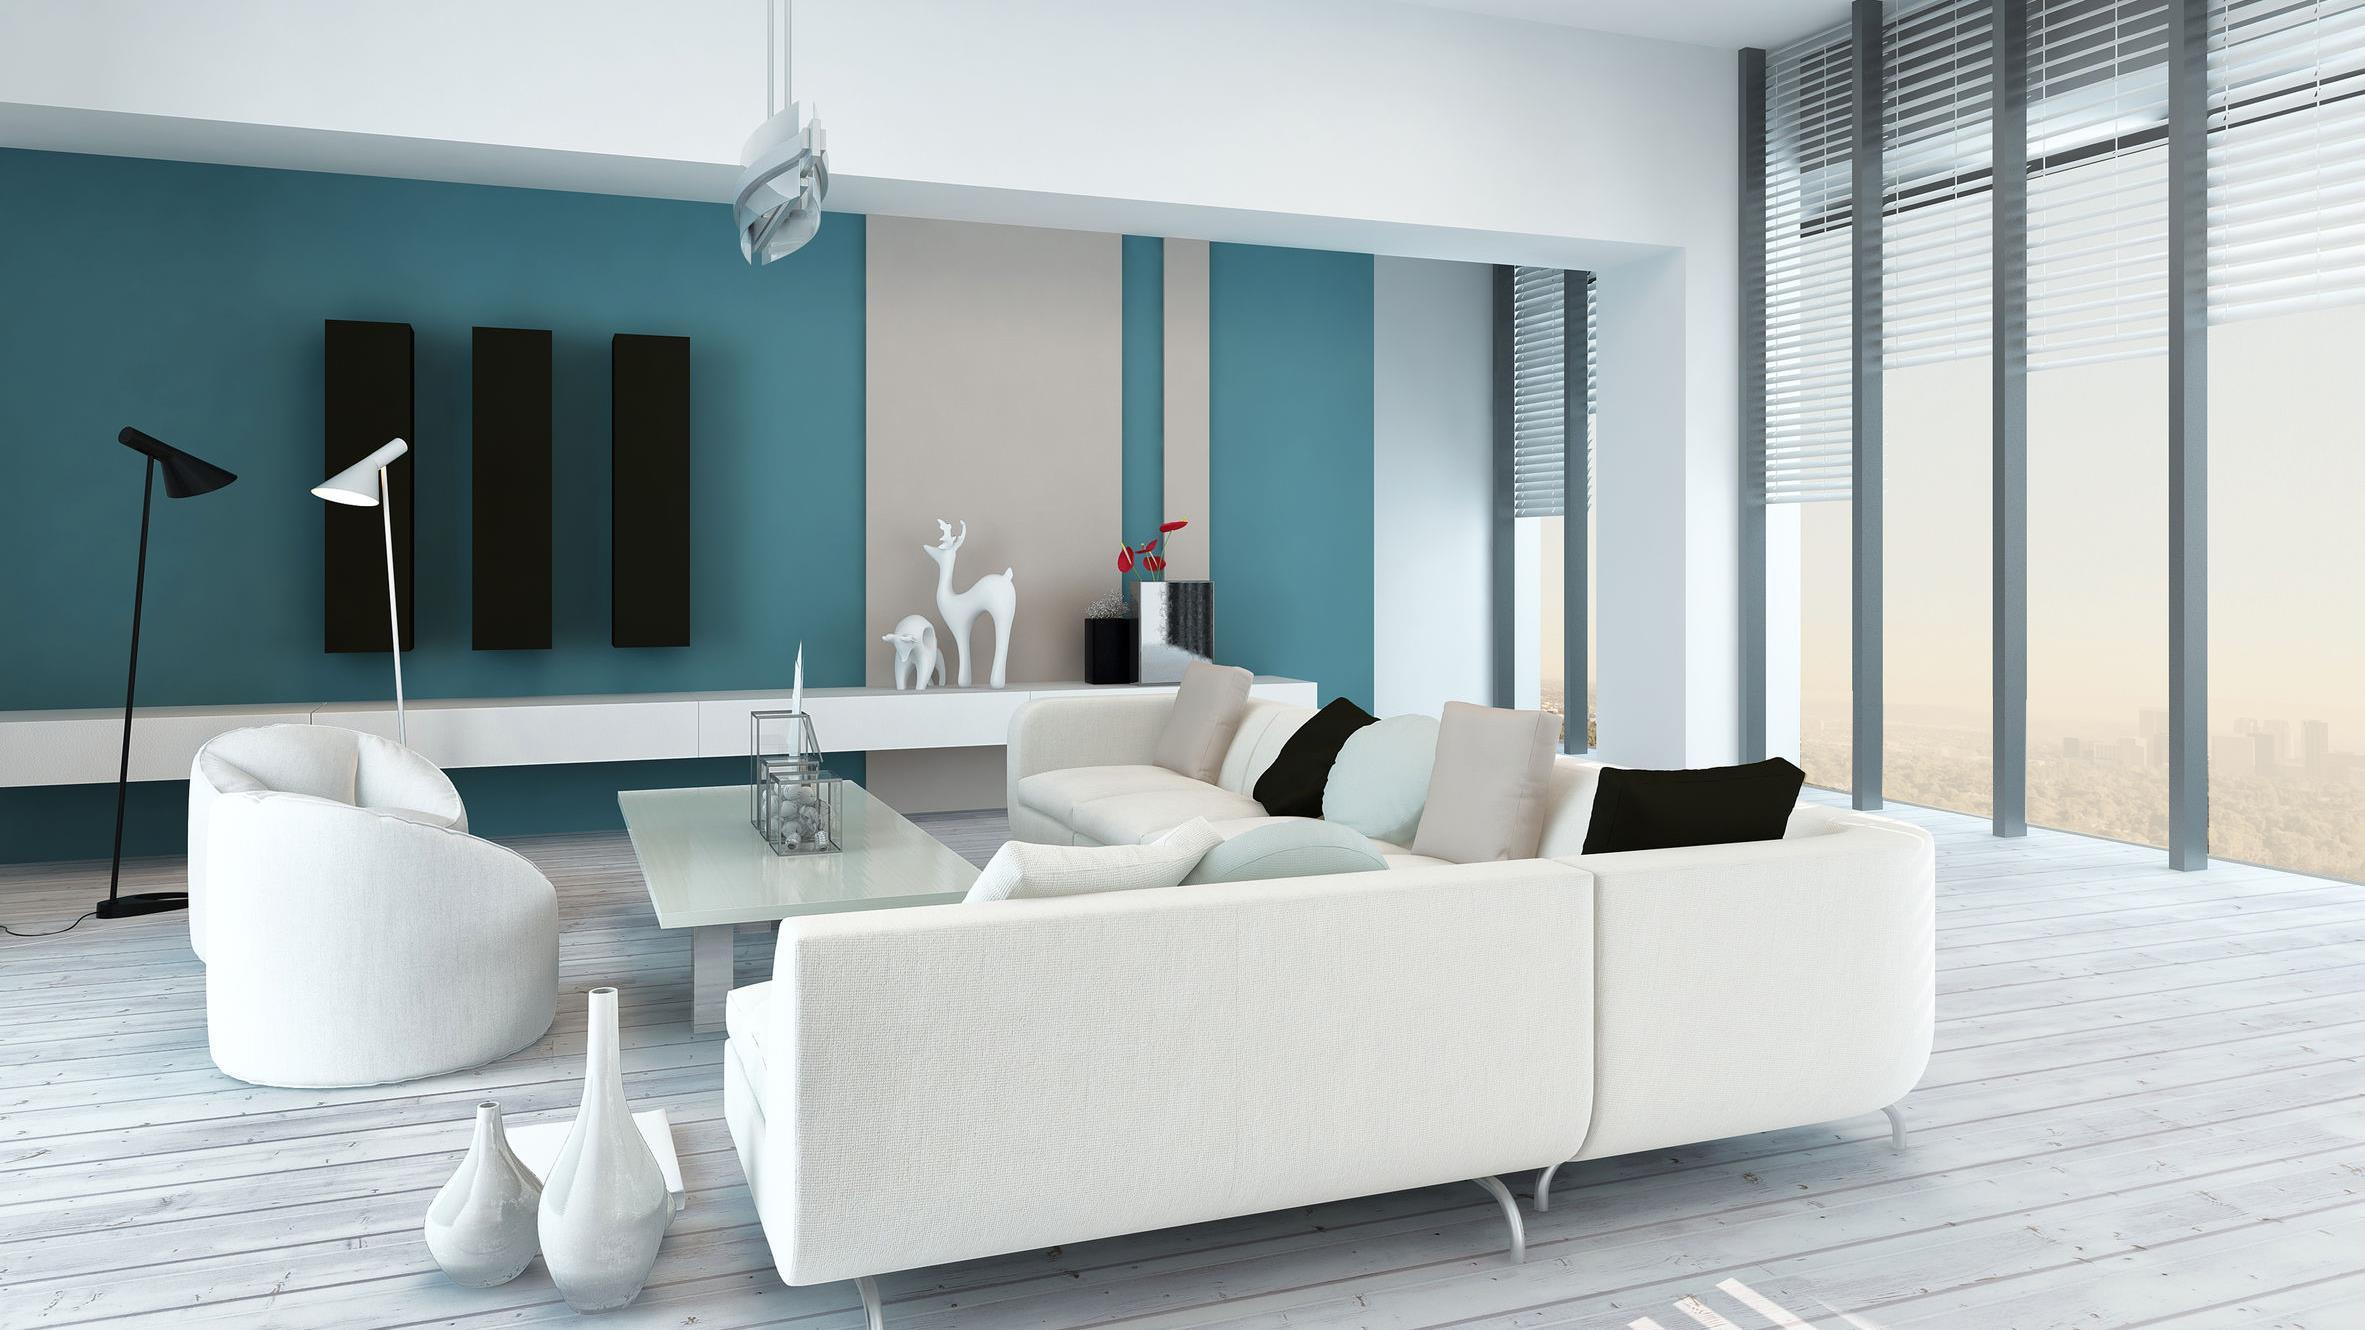 VR - Besucherraum | Immobilien Gerhardts GbR